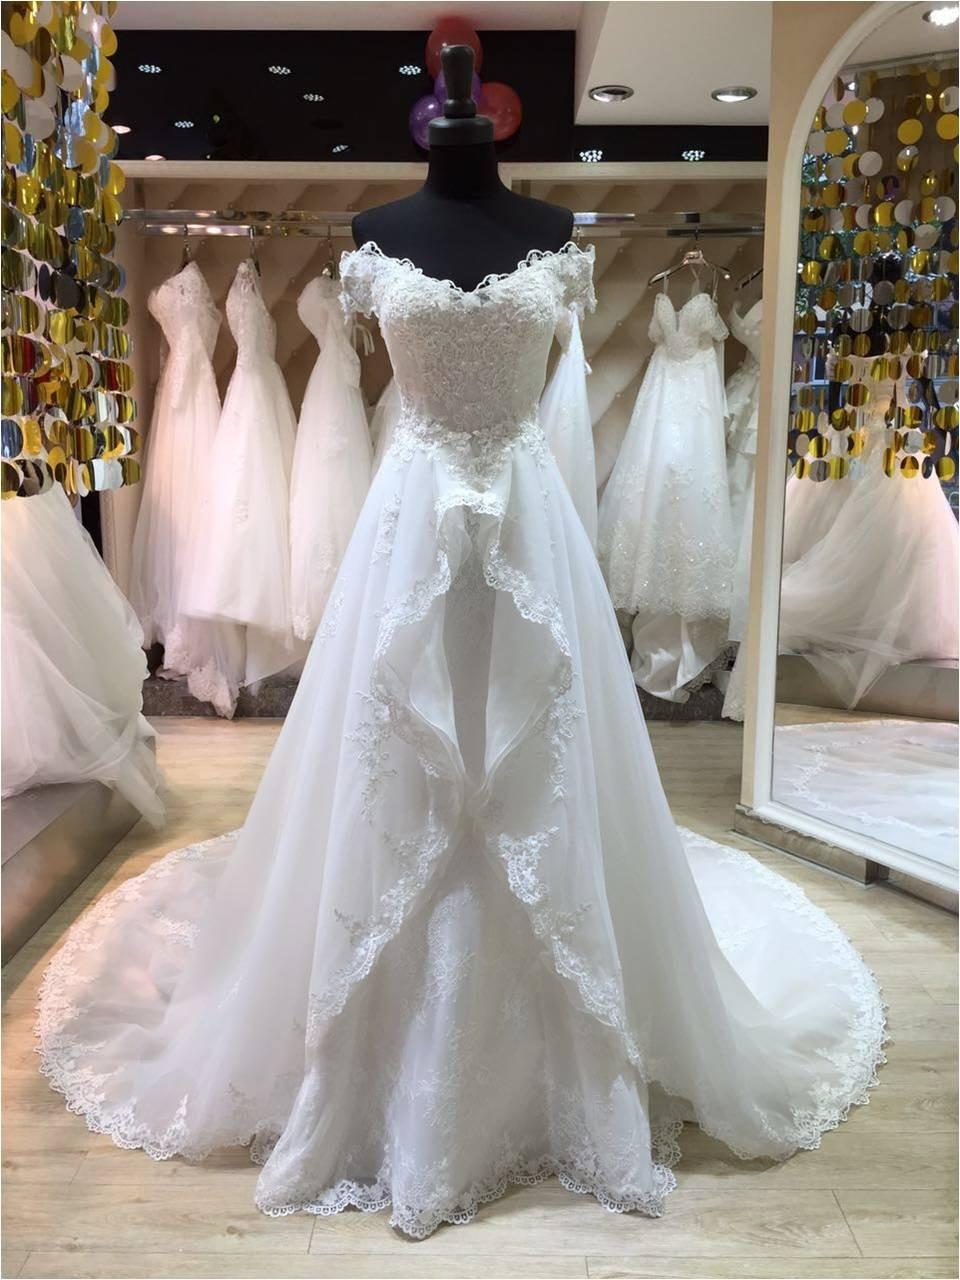 Off The Shoulder Mermaid 2018 Vestido De Novia Casamento Lace Bridal Detachable Train Gown Mother Of The Bride Dresses